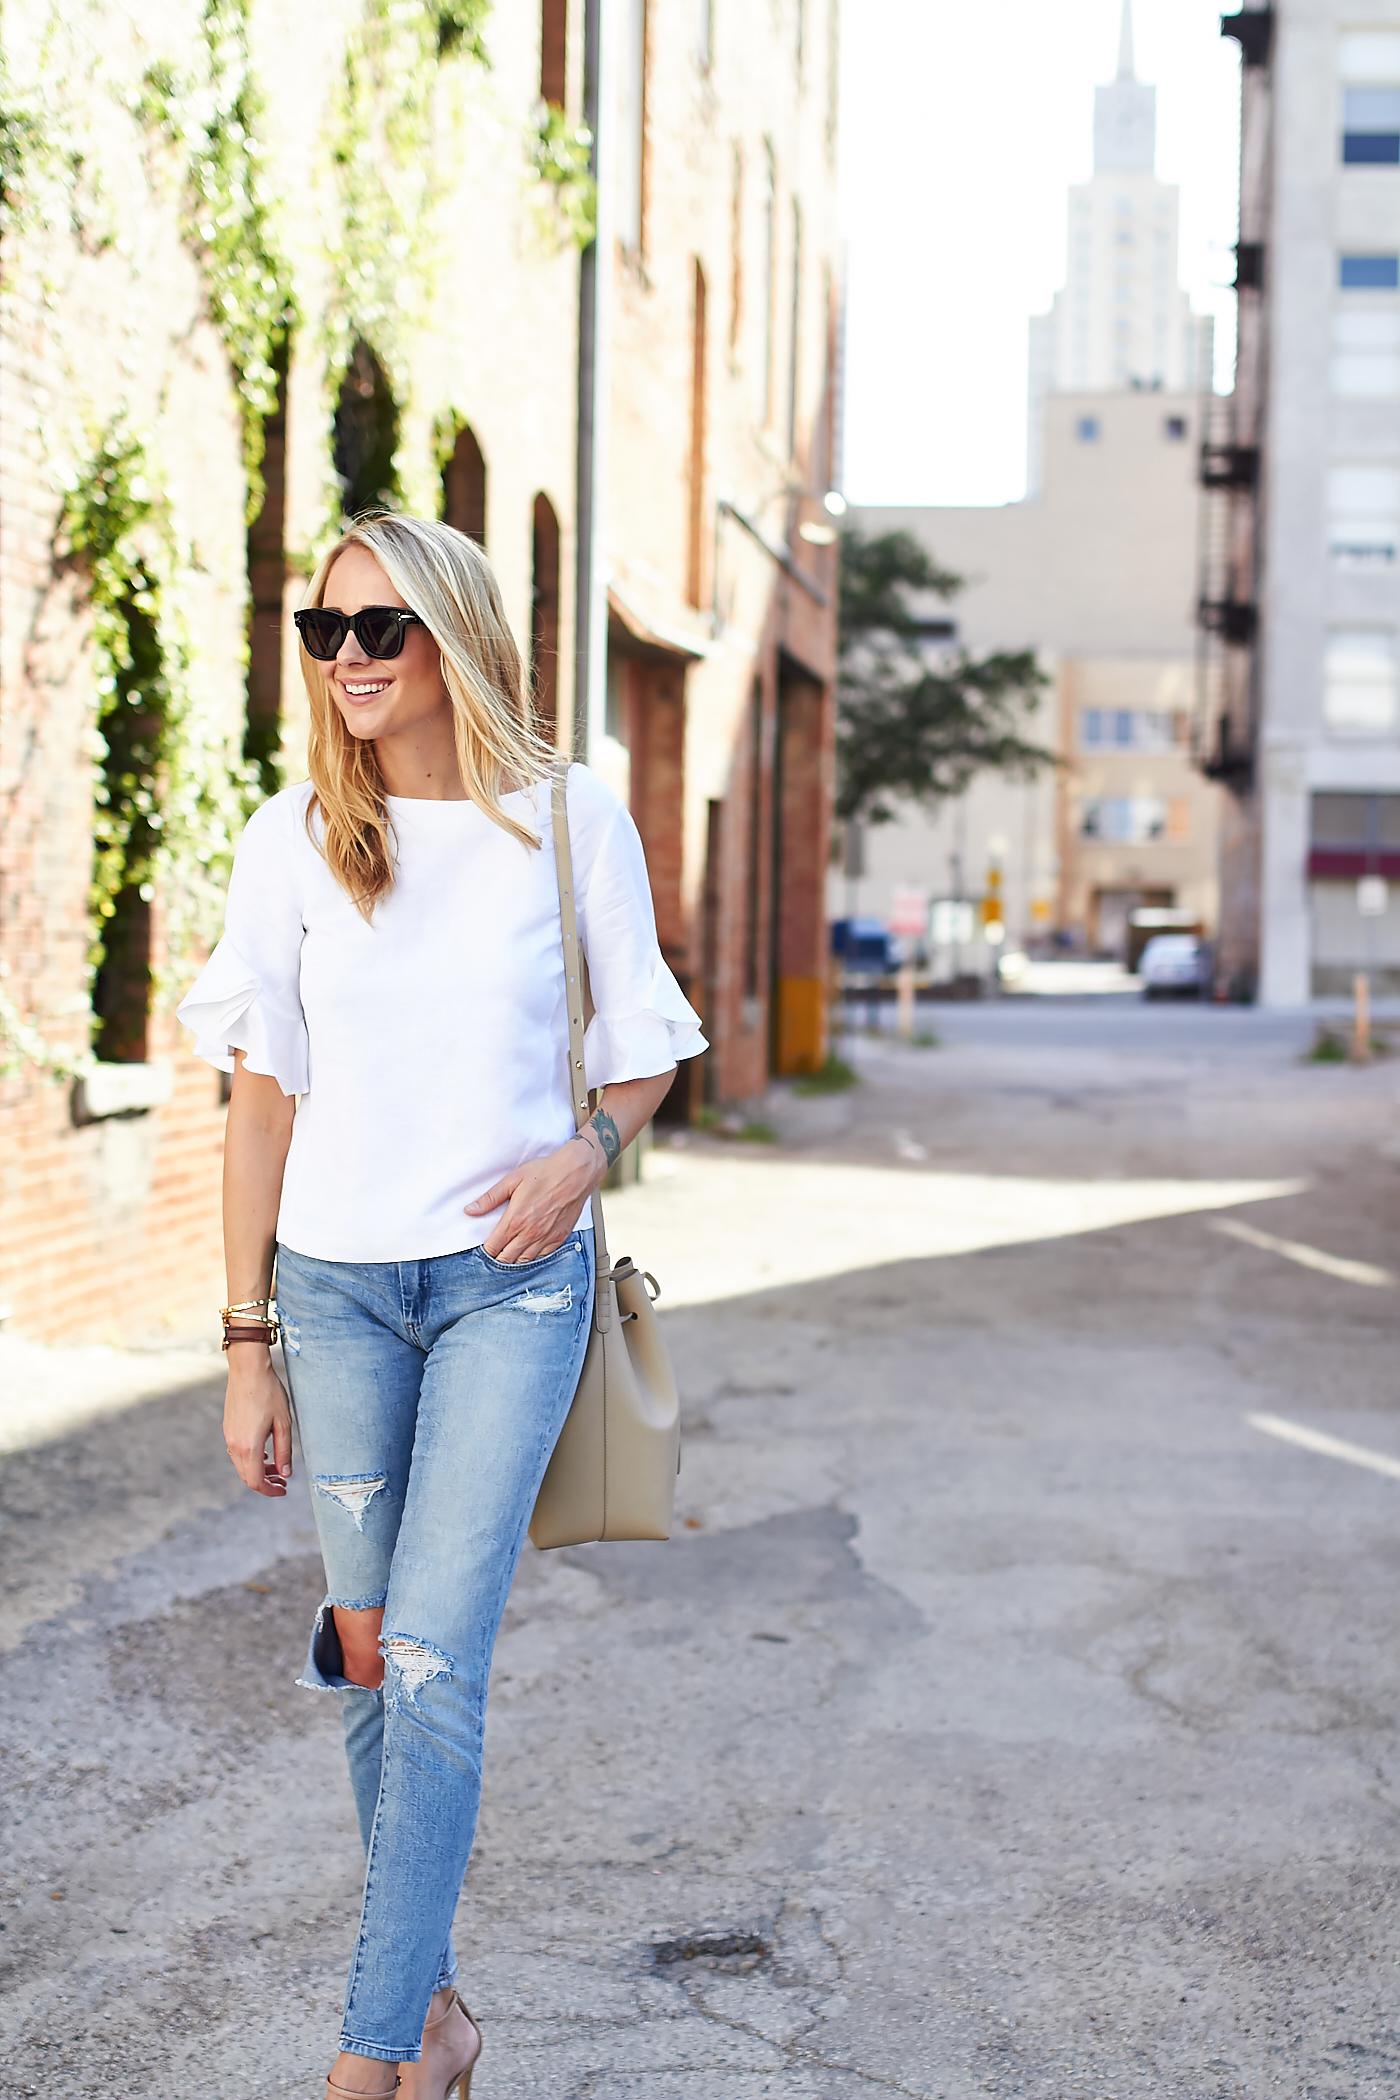 fashion-jackson-club-monaco-white-ruffle-sleeve-top-distressed-skinny-jeans-nordstrom-anniversary-sale